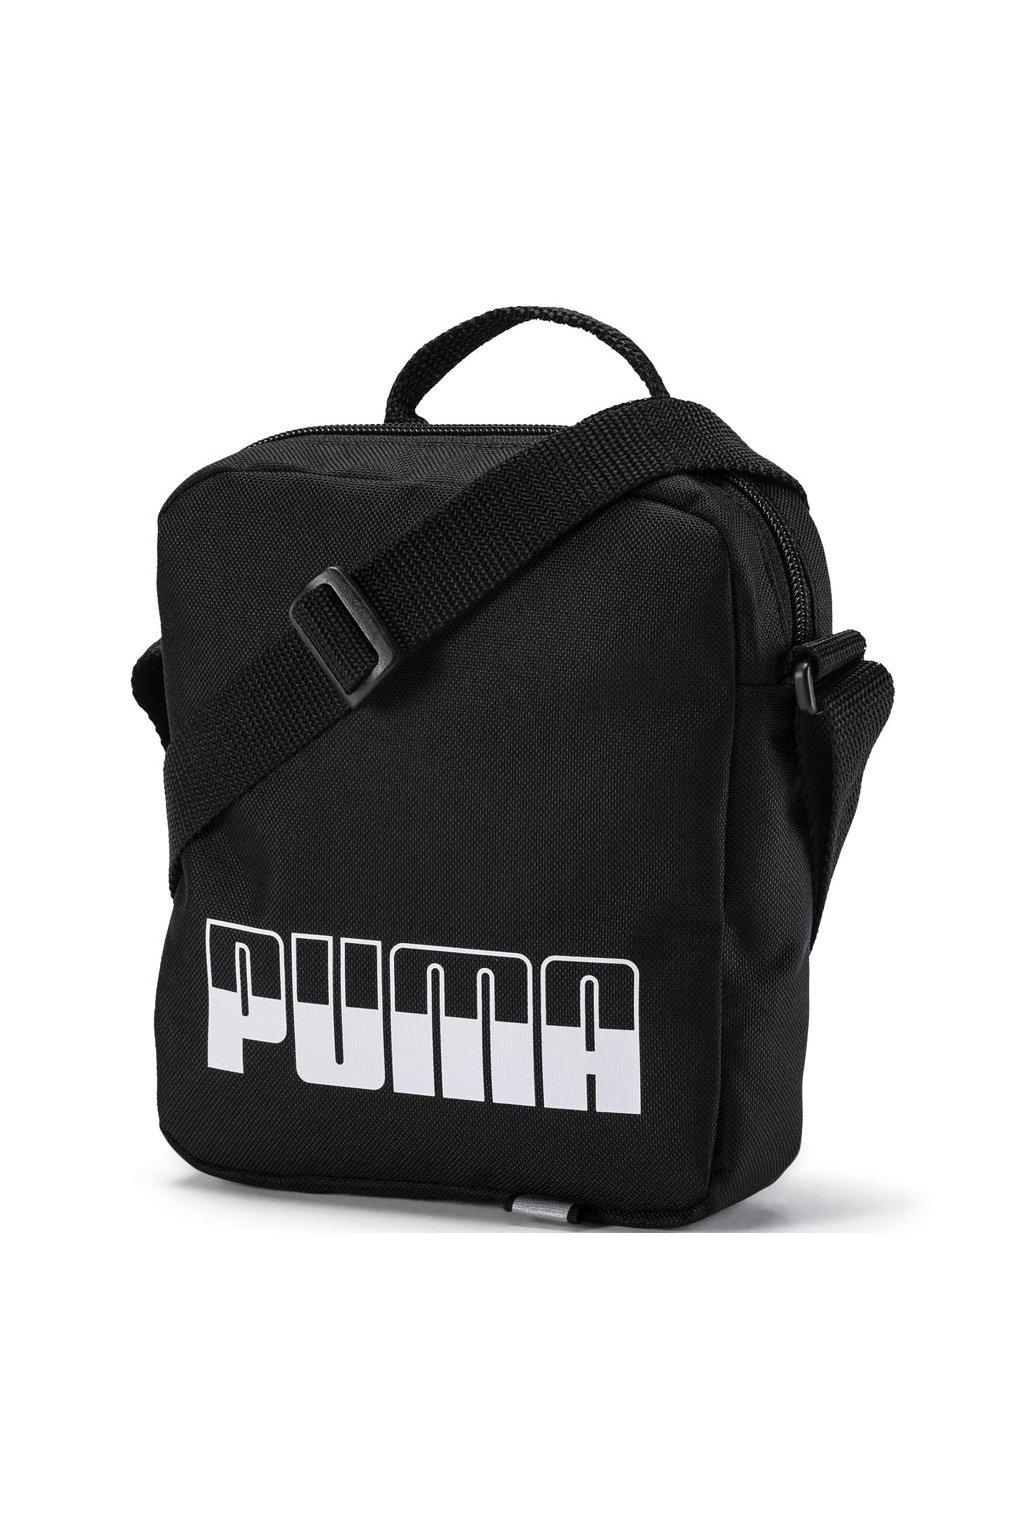 Taška Puma Plus II čierna 076061 01